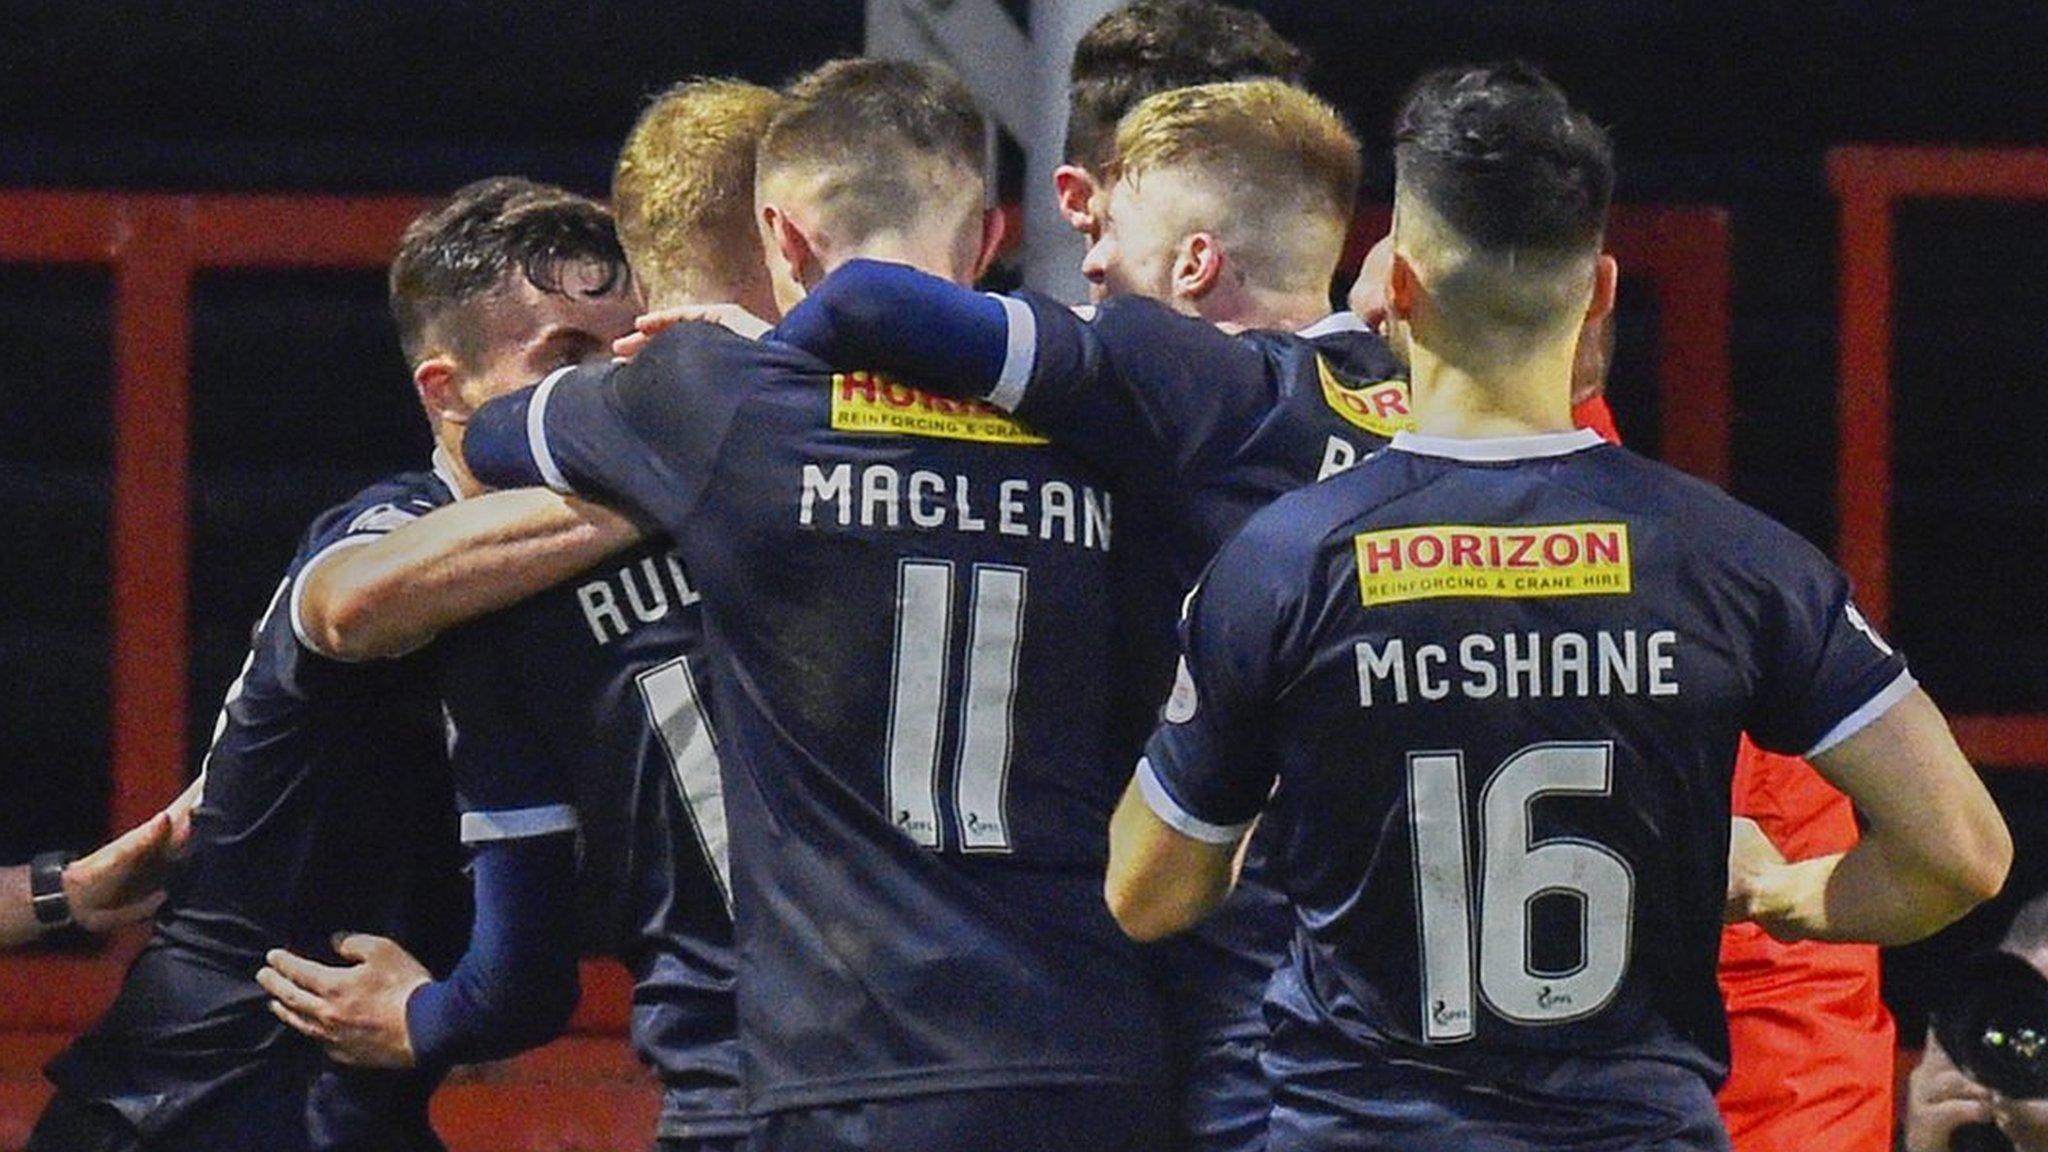 Partick Thistle 1-1 Falkirk: Rudden strike earns visitors vital point